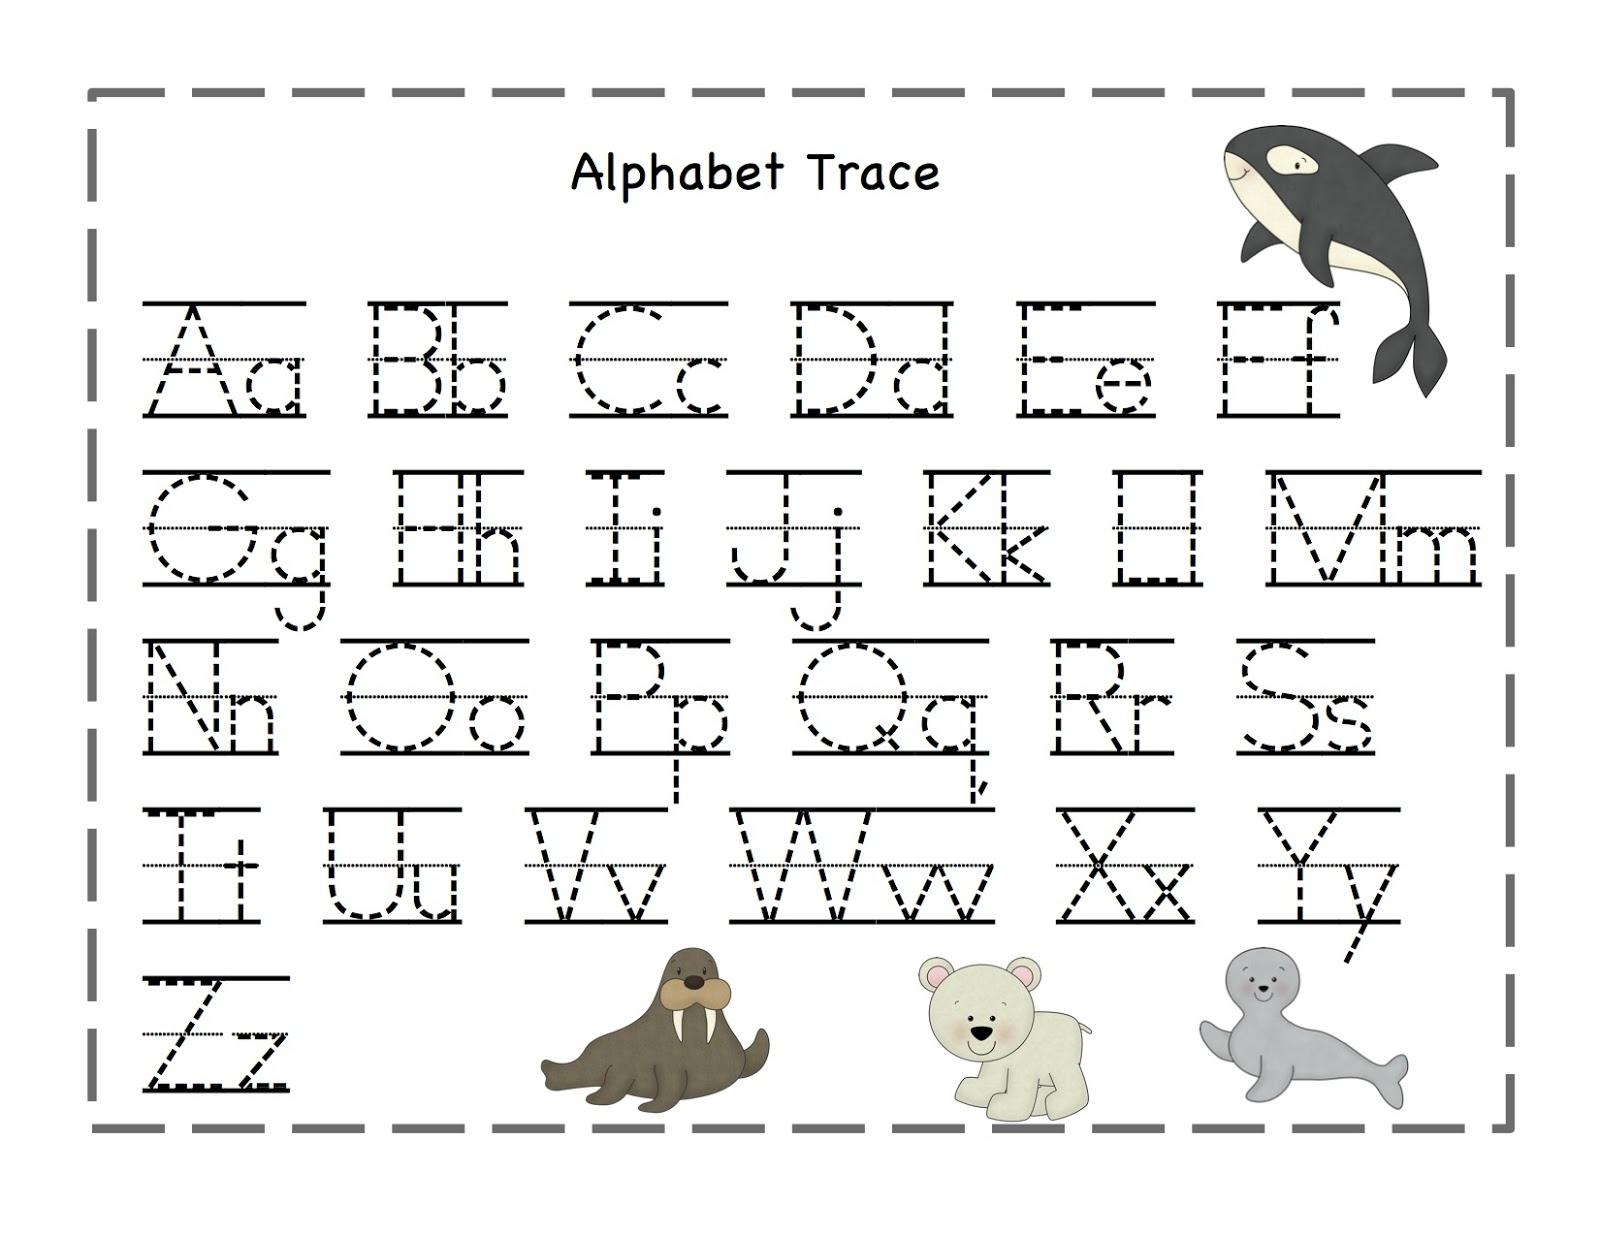 Free Printable Alphabet Tracing Worksheets Number For Kindergarten - Free Printable Alphabet Pages